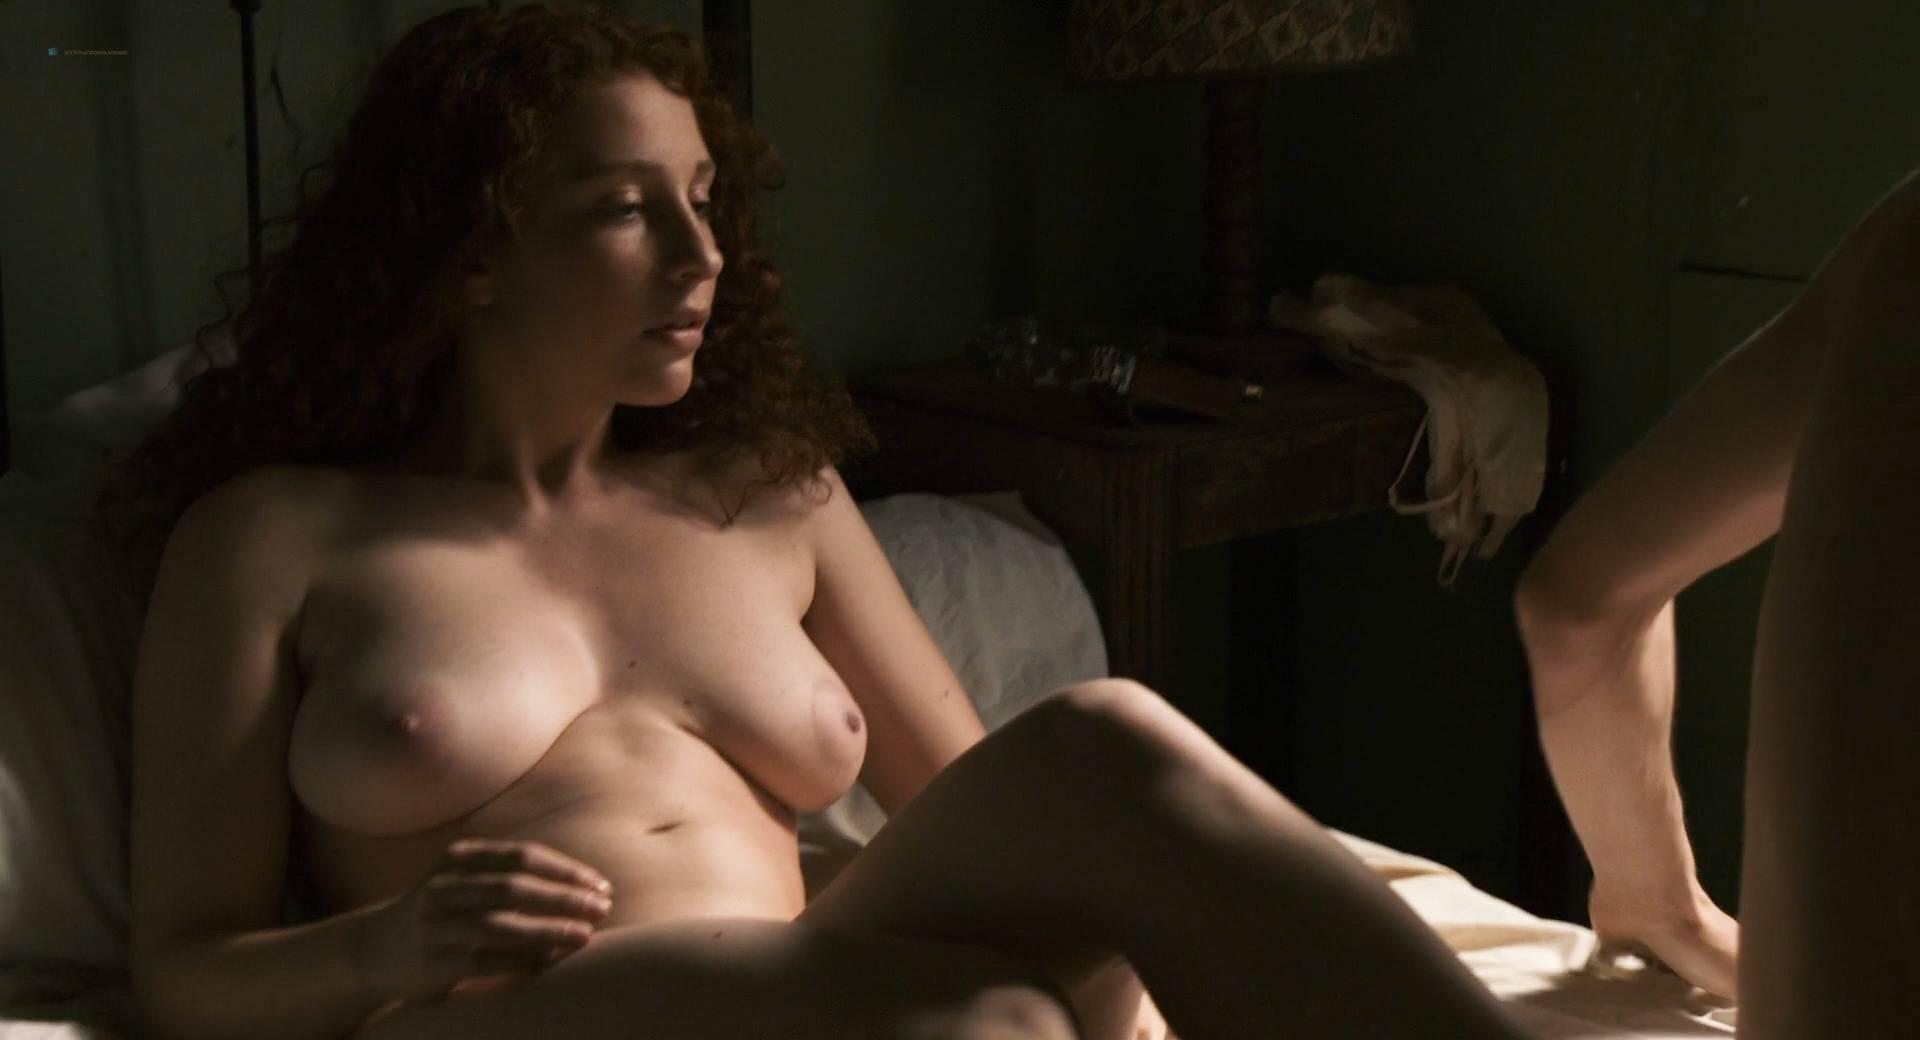 Virginie ledoyen nude scenes in the backwoods